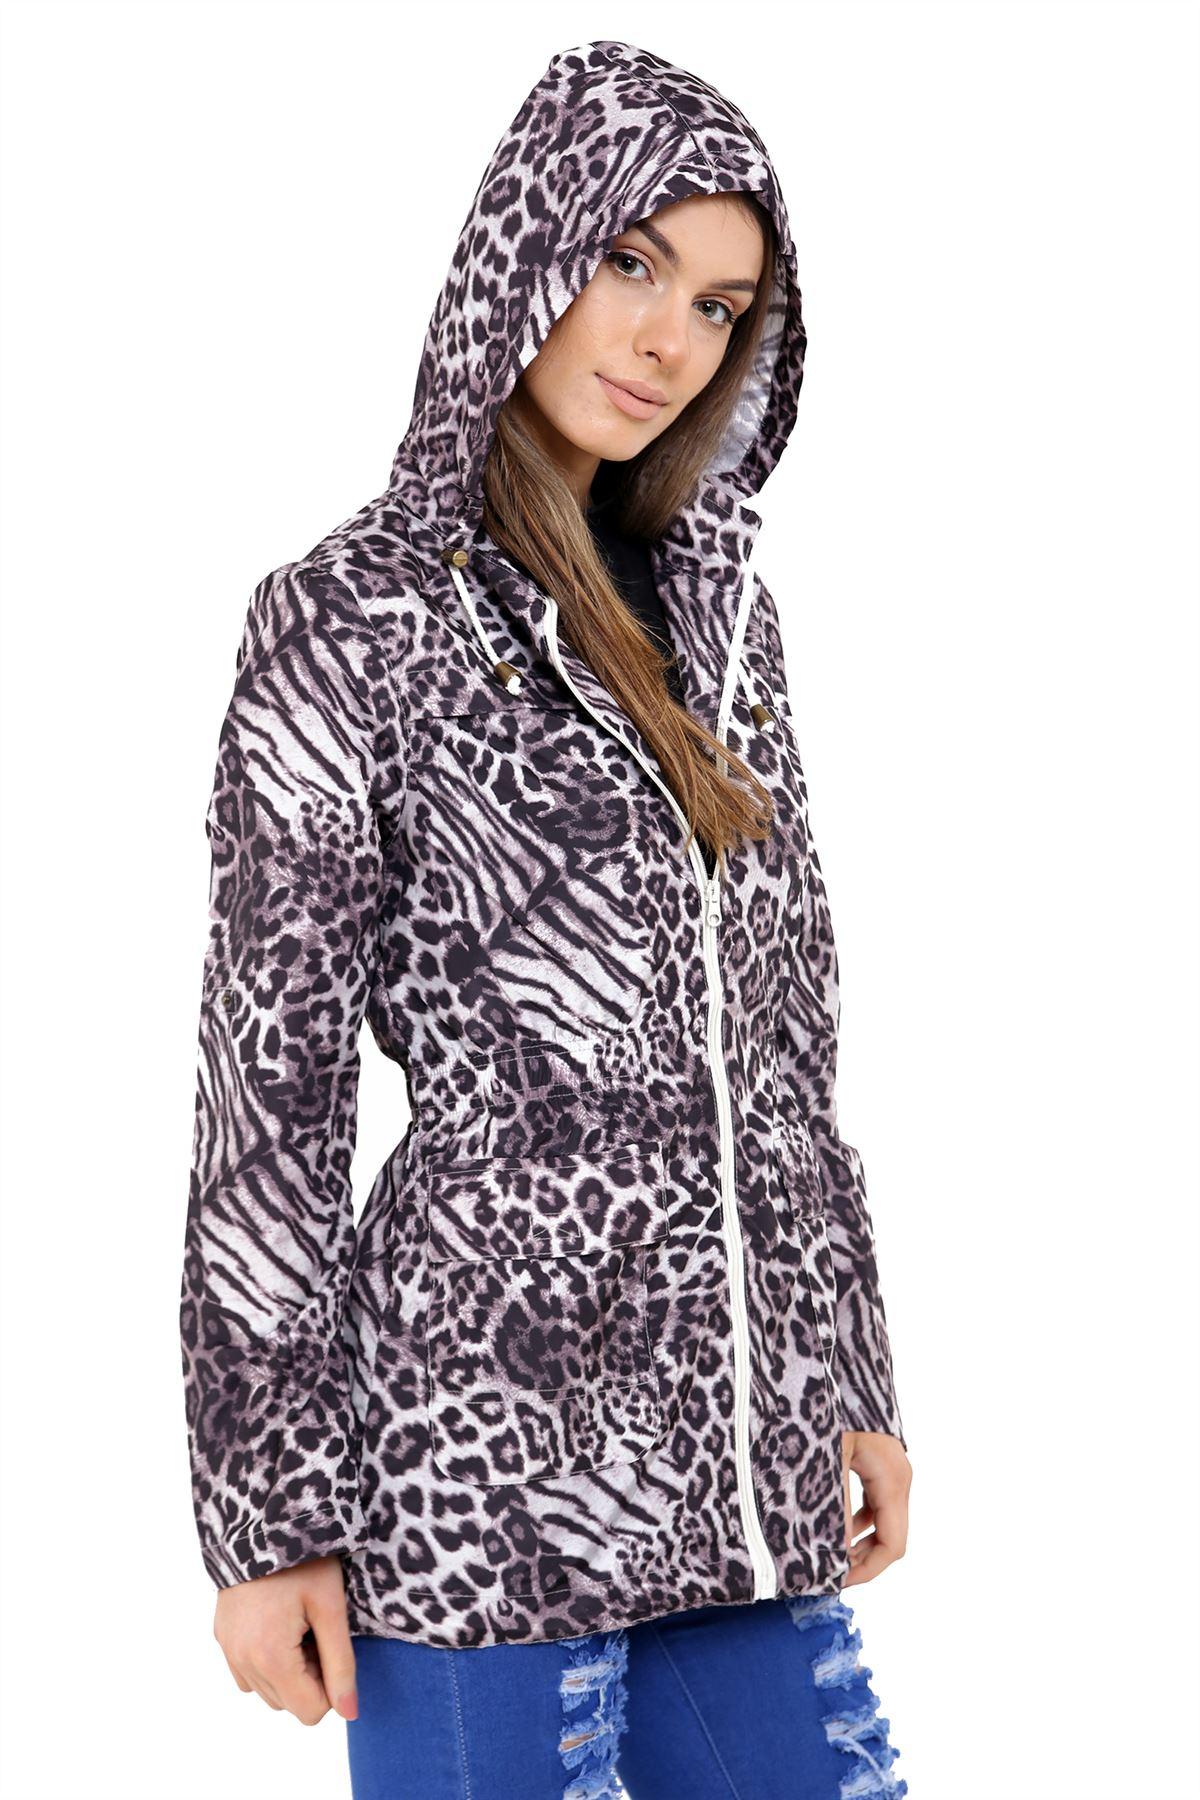 New Womens Animal Print Fishtail Parka Showerproof Lightweight Rain Jacket